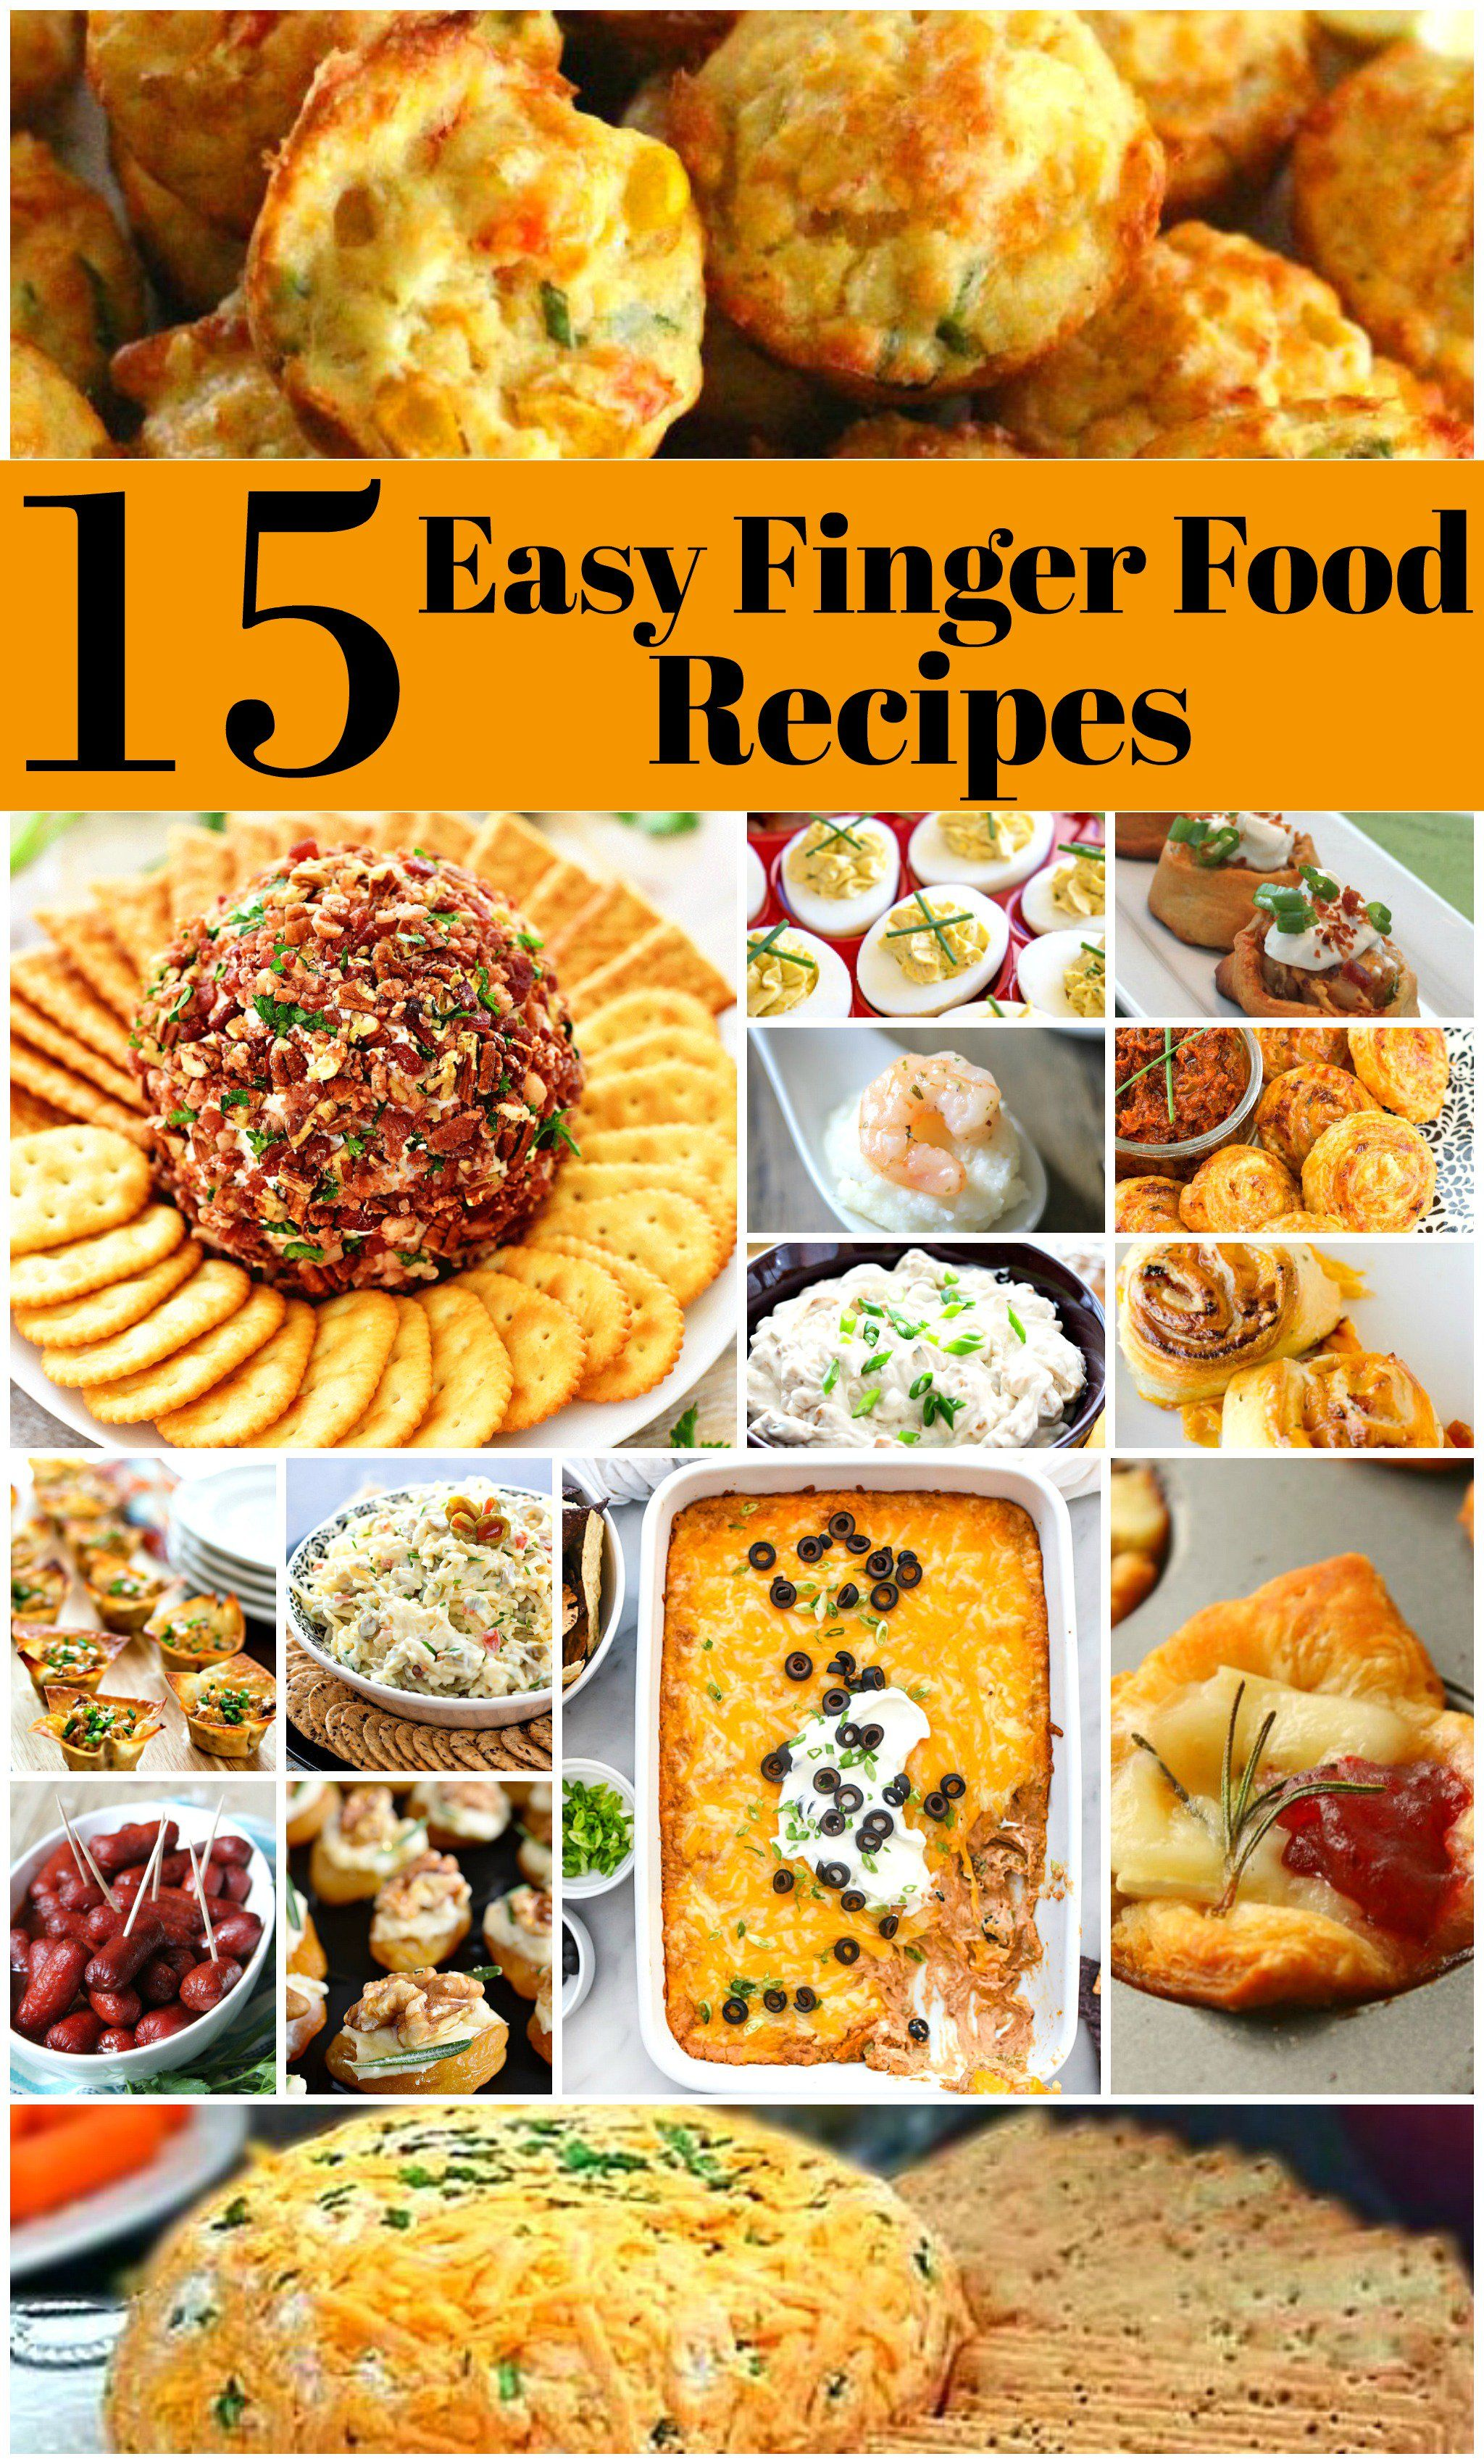 15 Easy To Make Finger Food Recipes Potluck finger foods